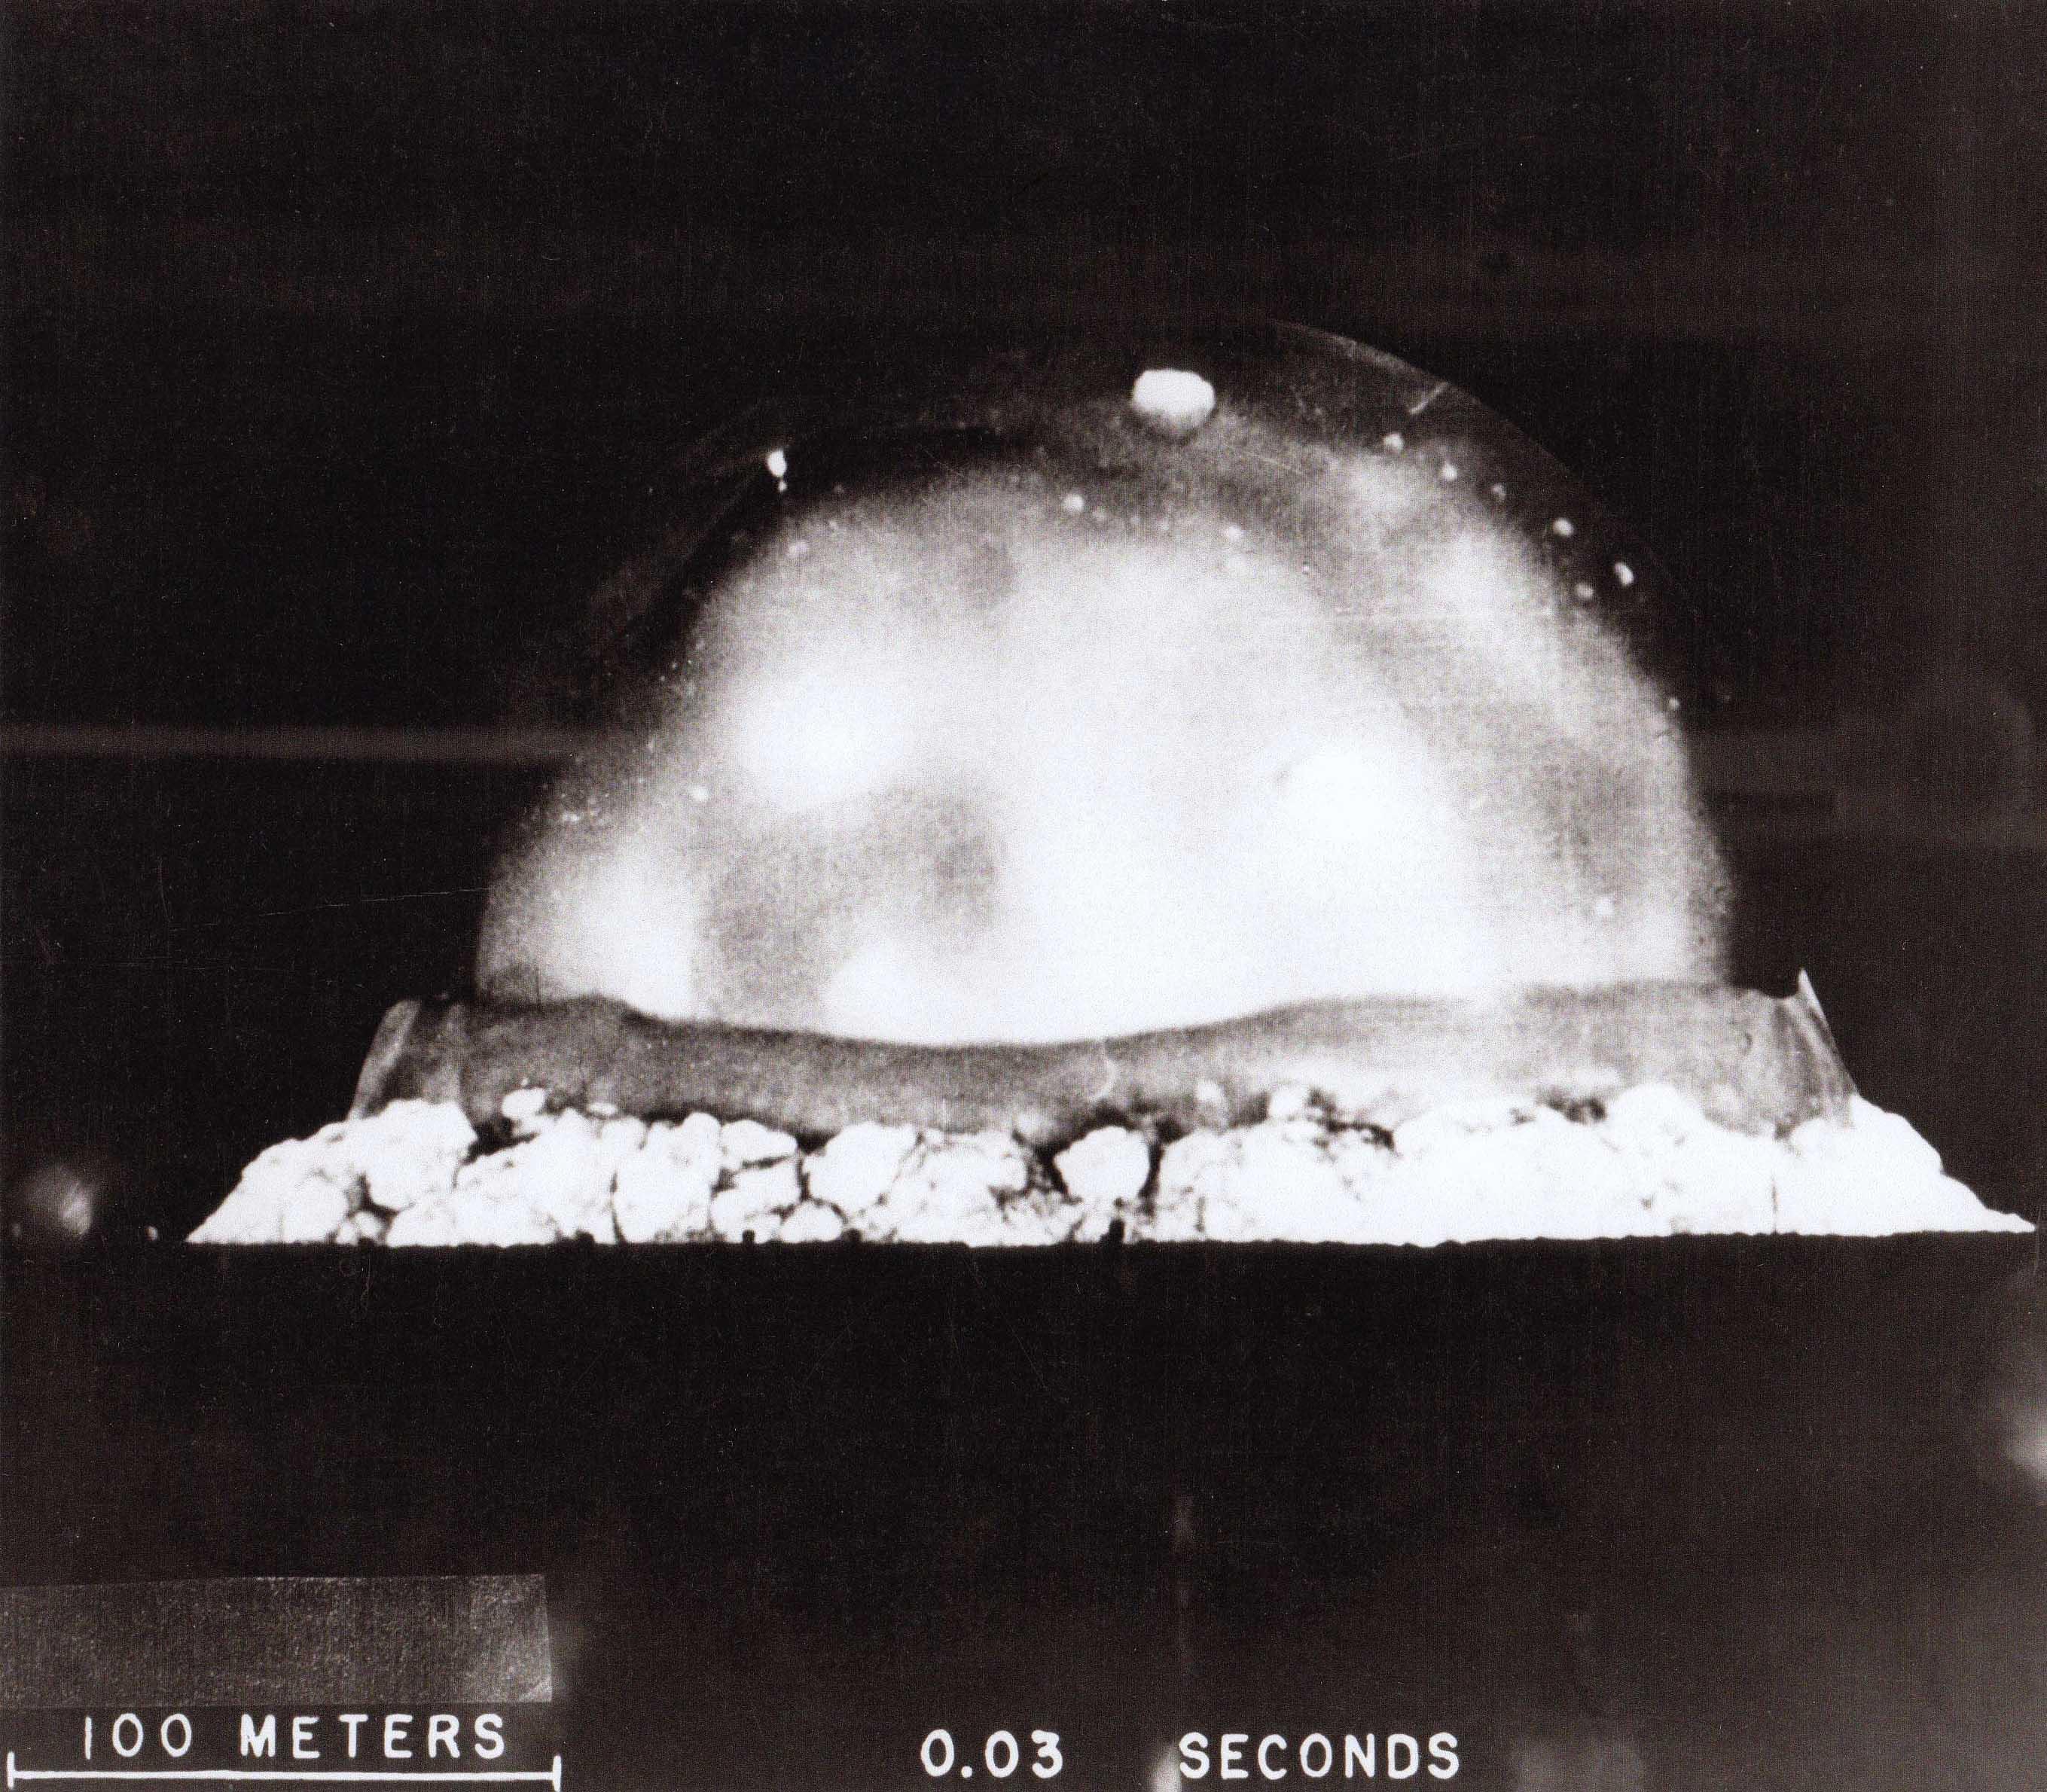 Trinity Detonation .003 seconds